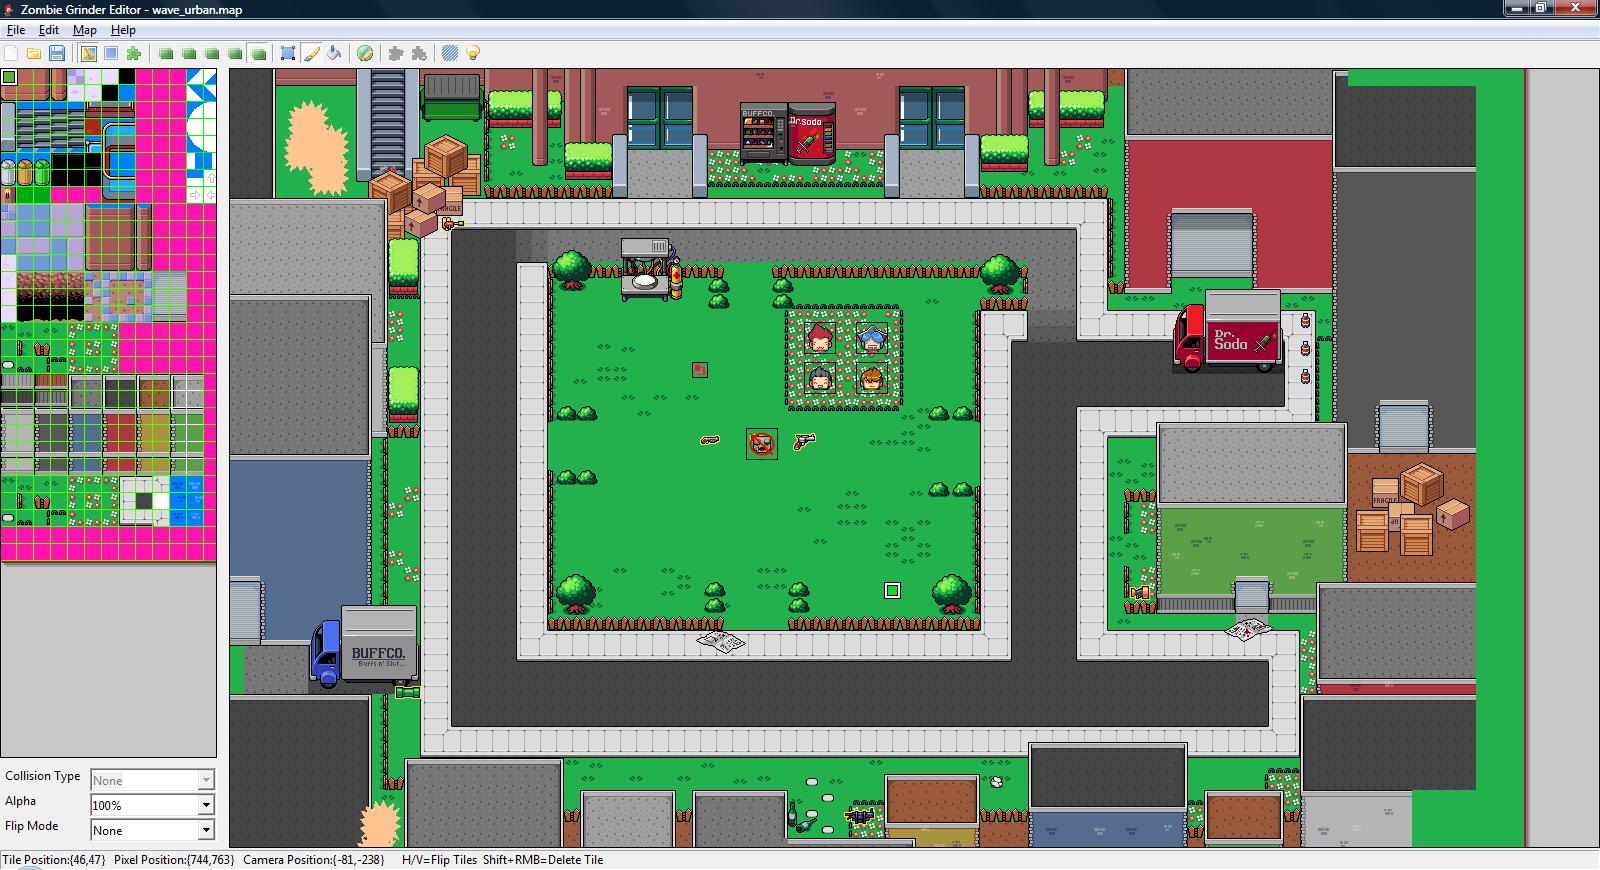 zombie grinder level editor image mod db